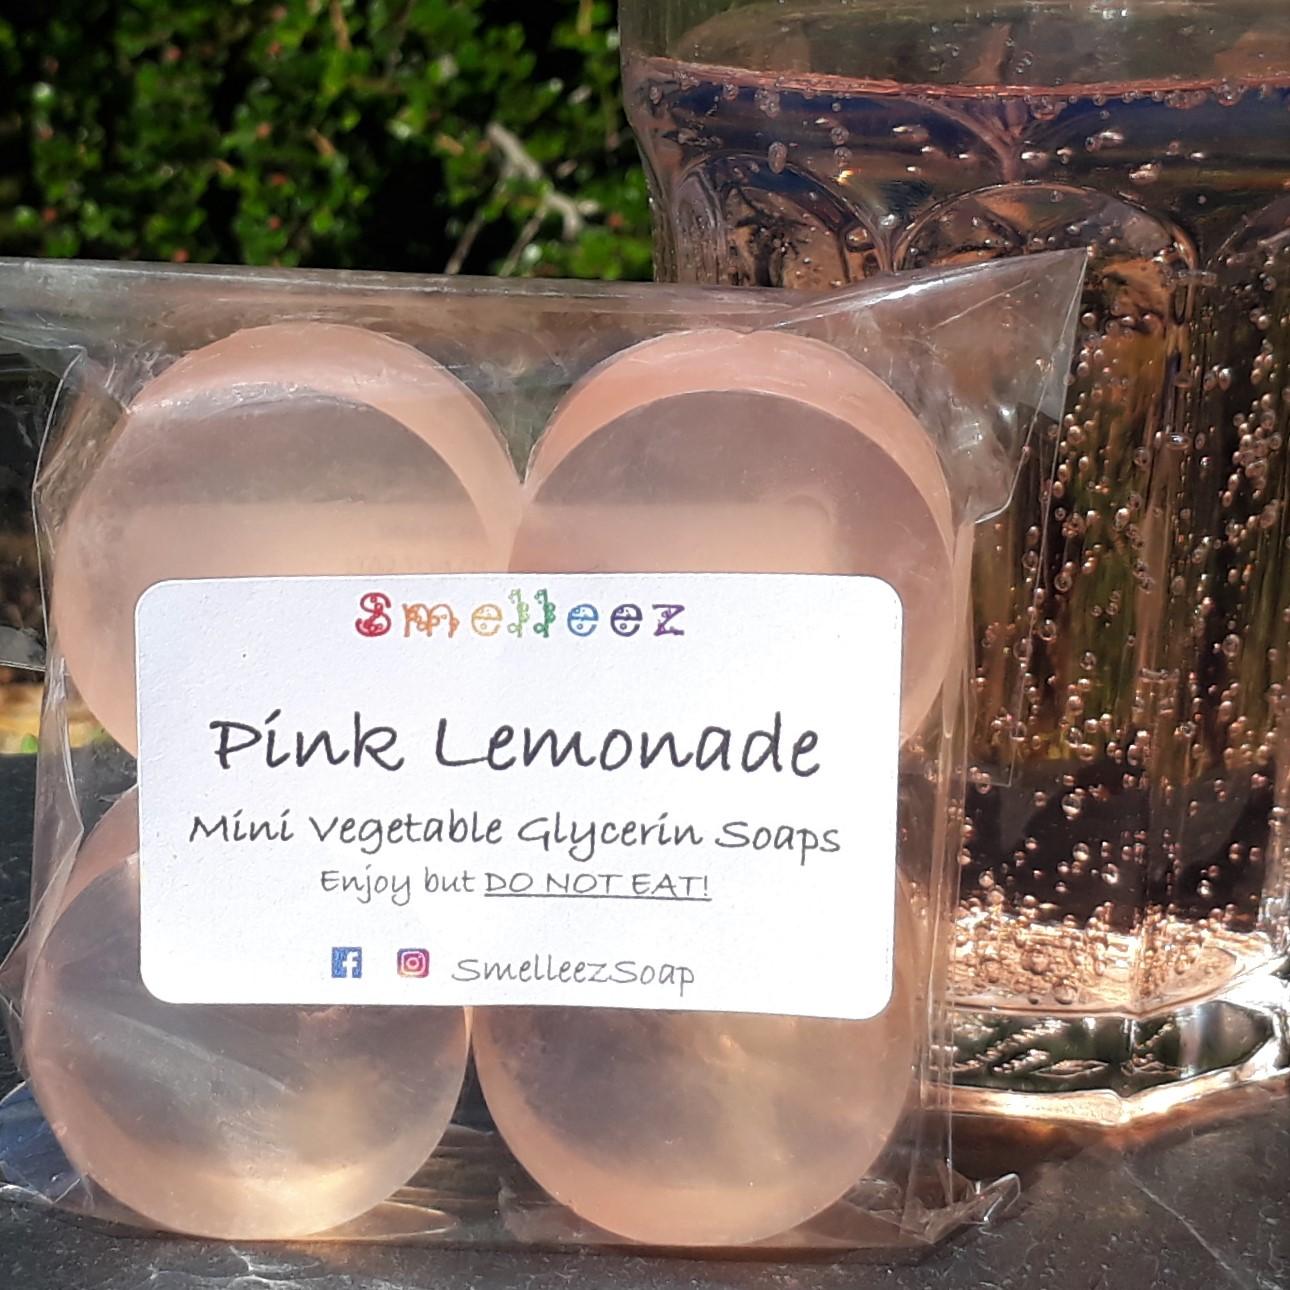 Mini Vegetable Glycerin Soap Bars (Pink Lemonade)